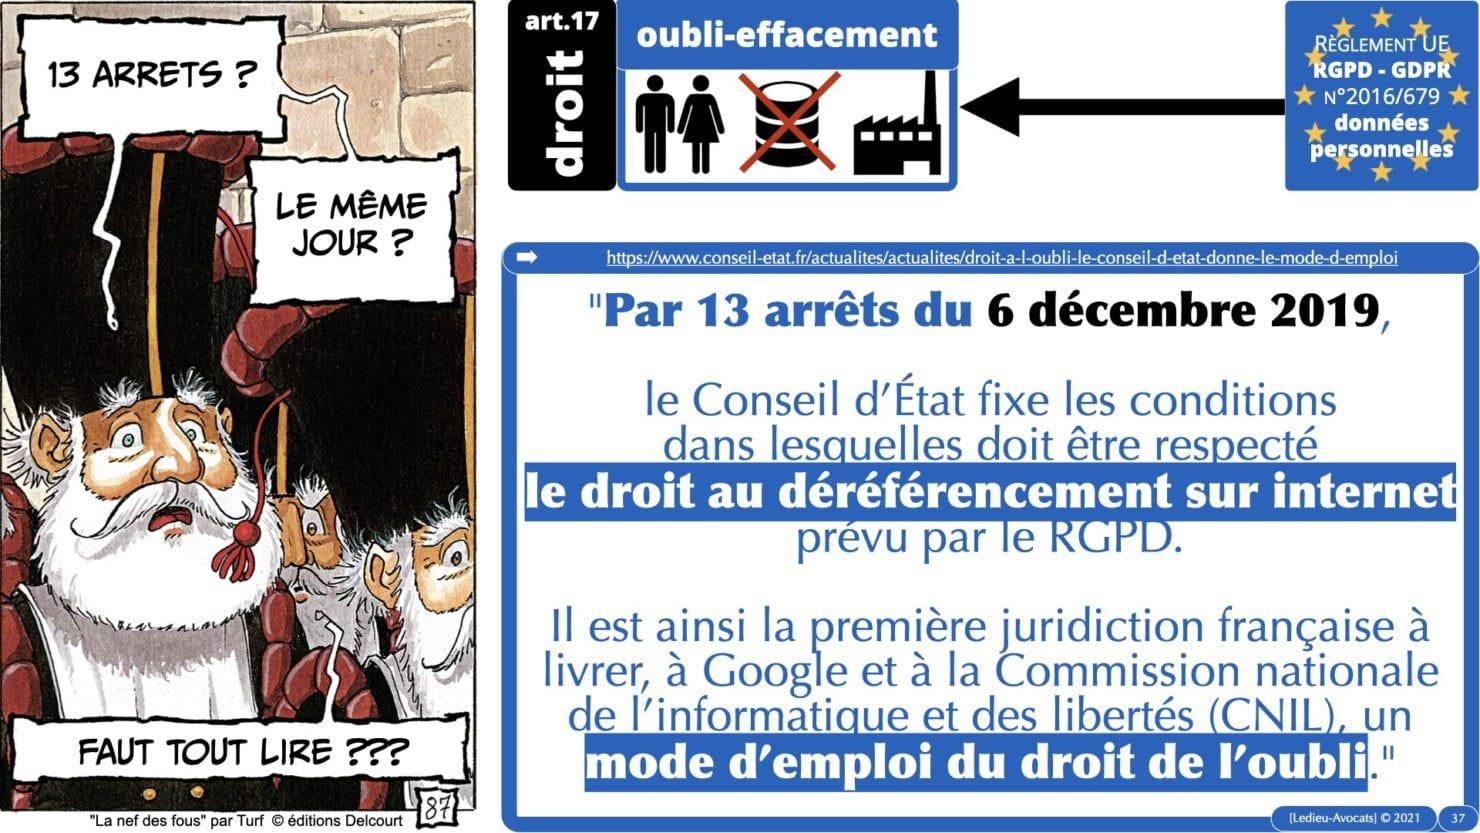 RGPD e-Privacy principes actualité jurisprudence ©Ledieu-Avocats 25-06-2021.037